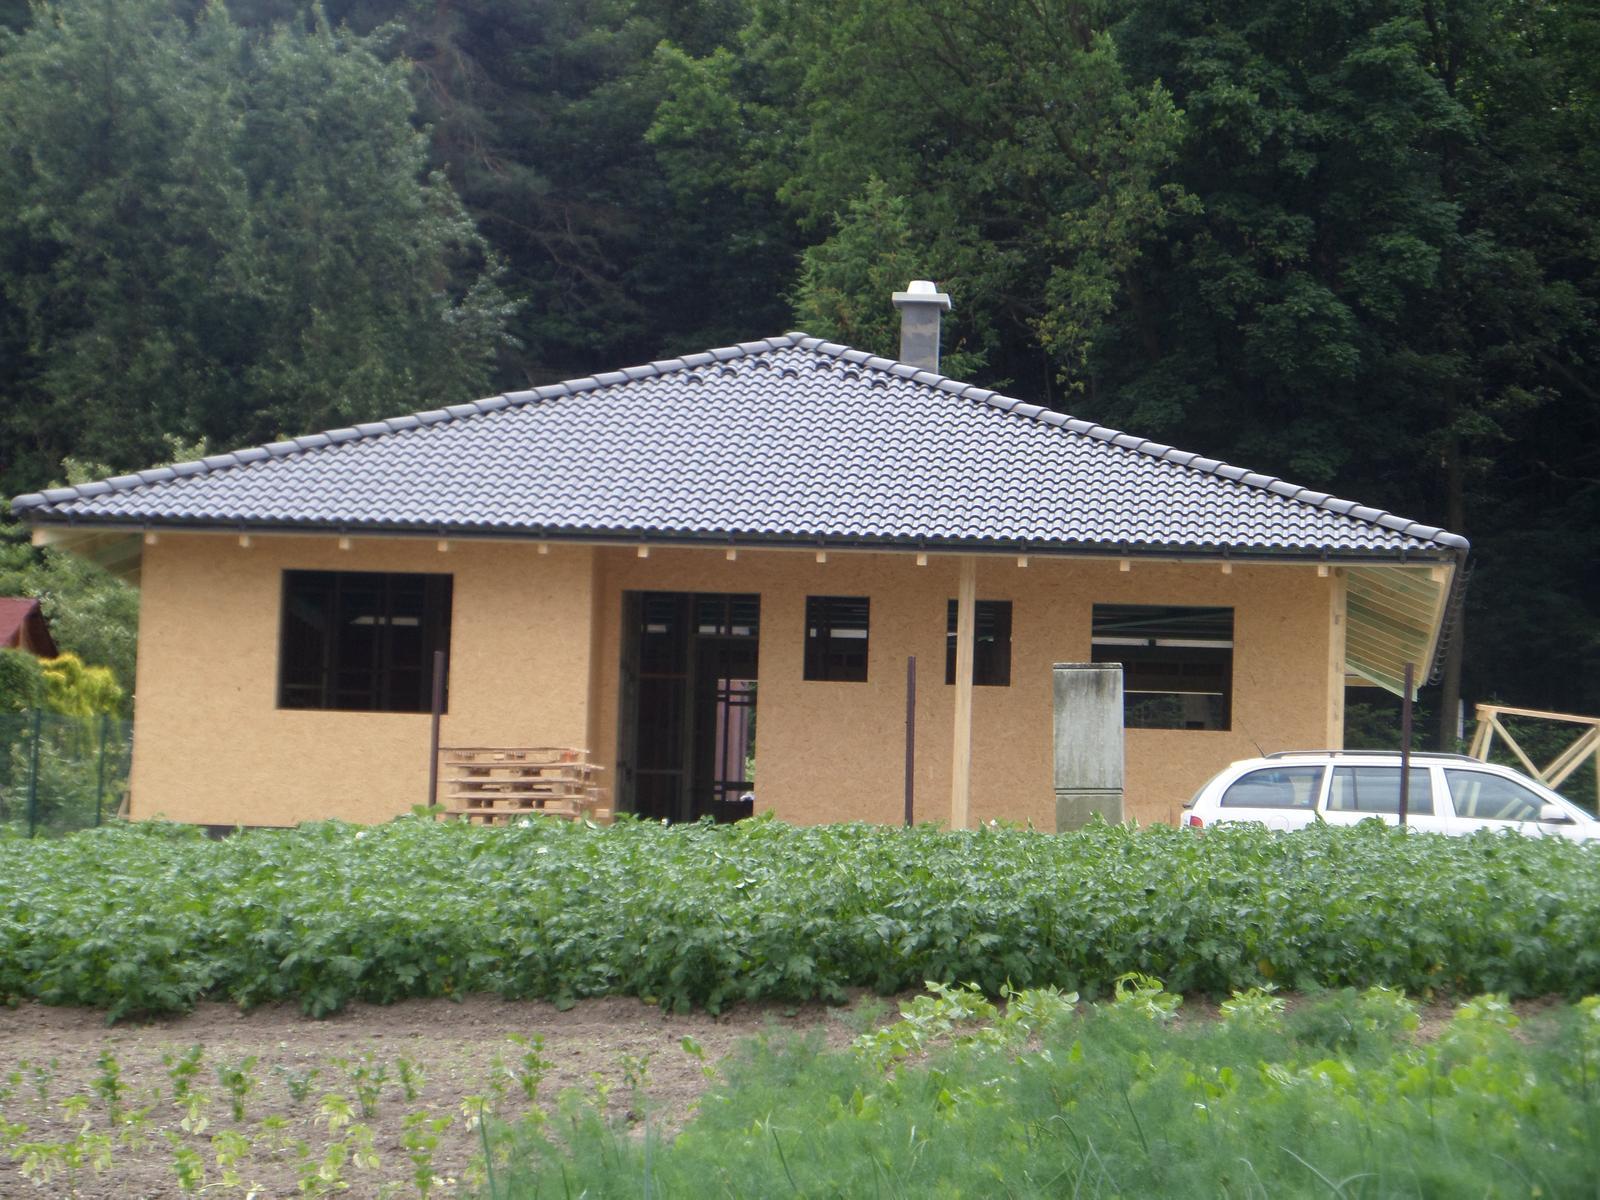 Bungalov Martina - 29.5. strecha komplet hotová